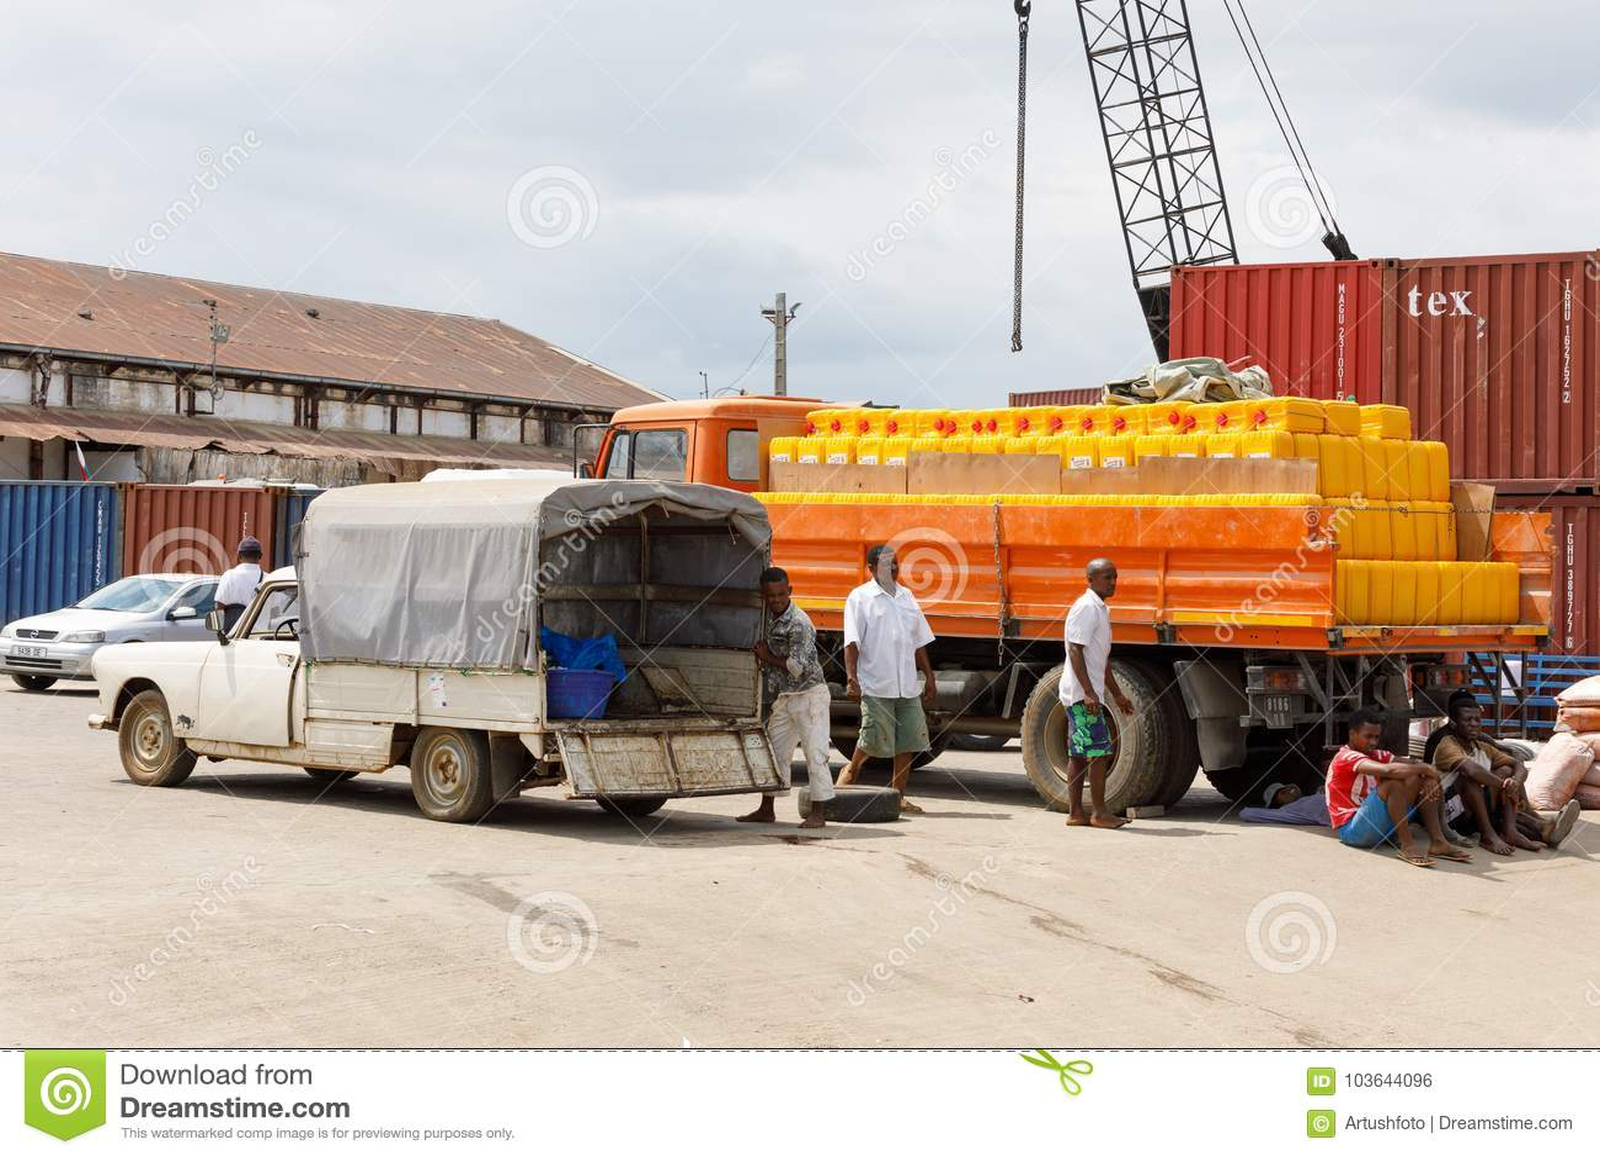 Transport cargo in port of Nosy Be, Madagascar